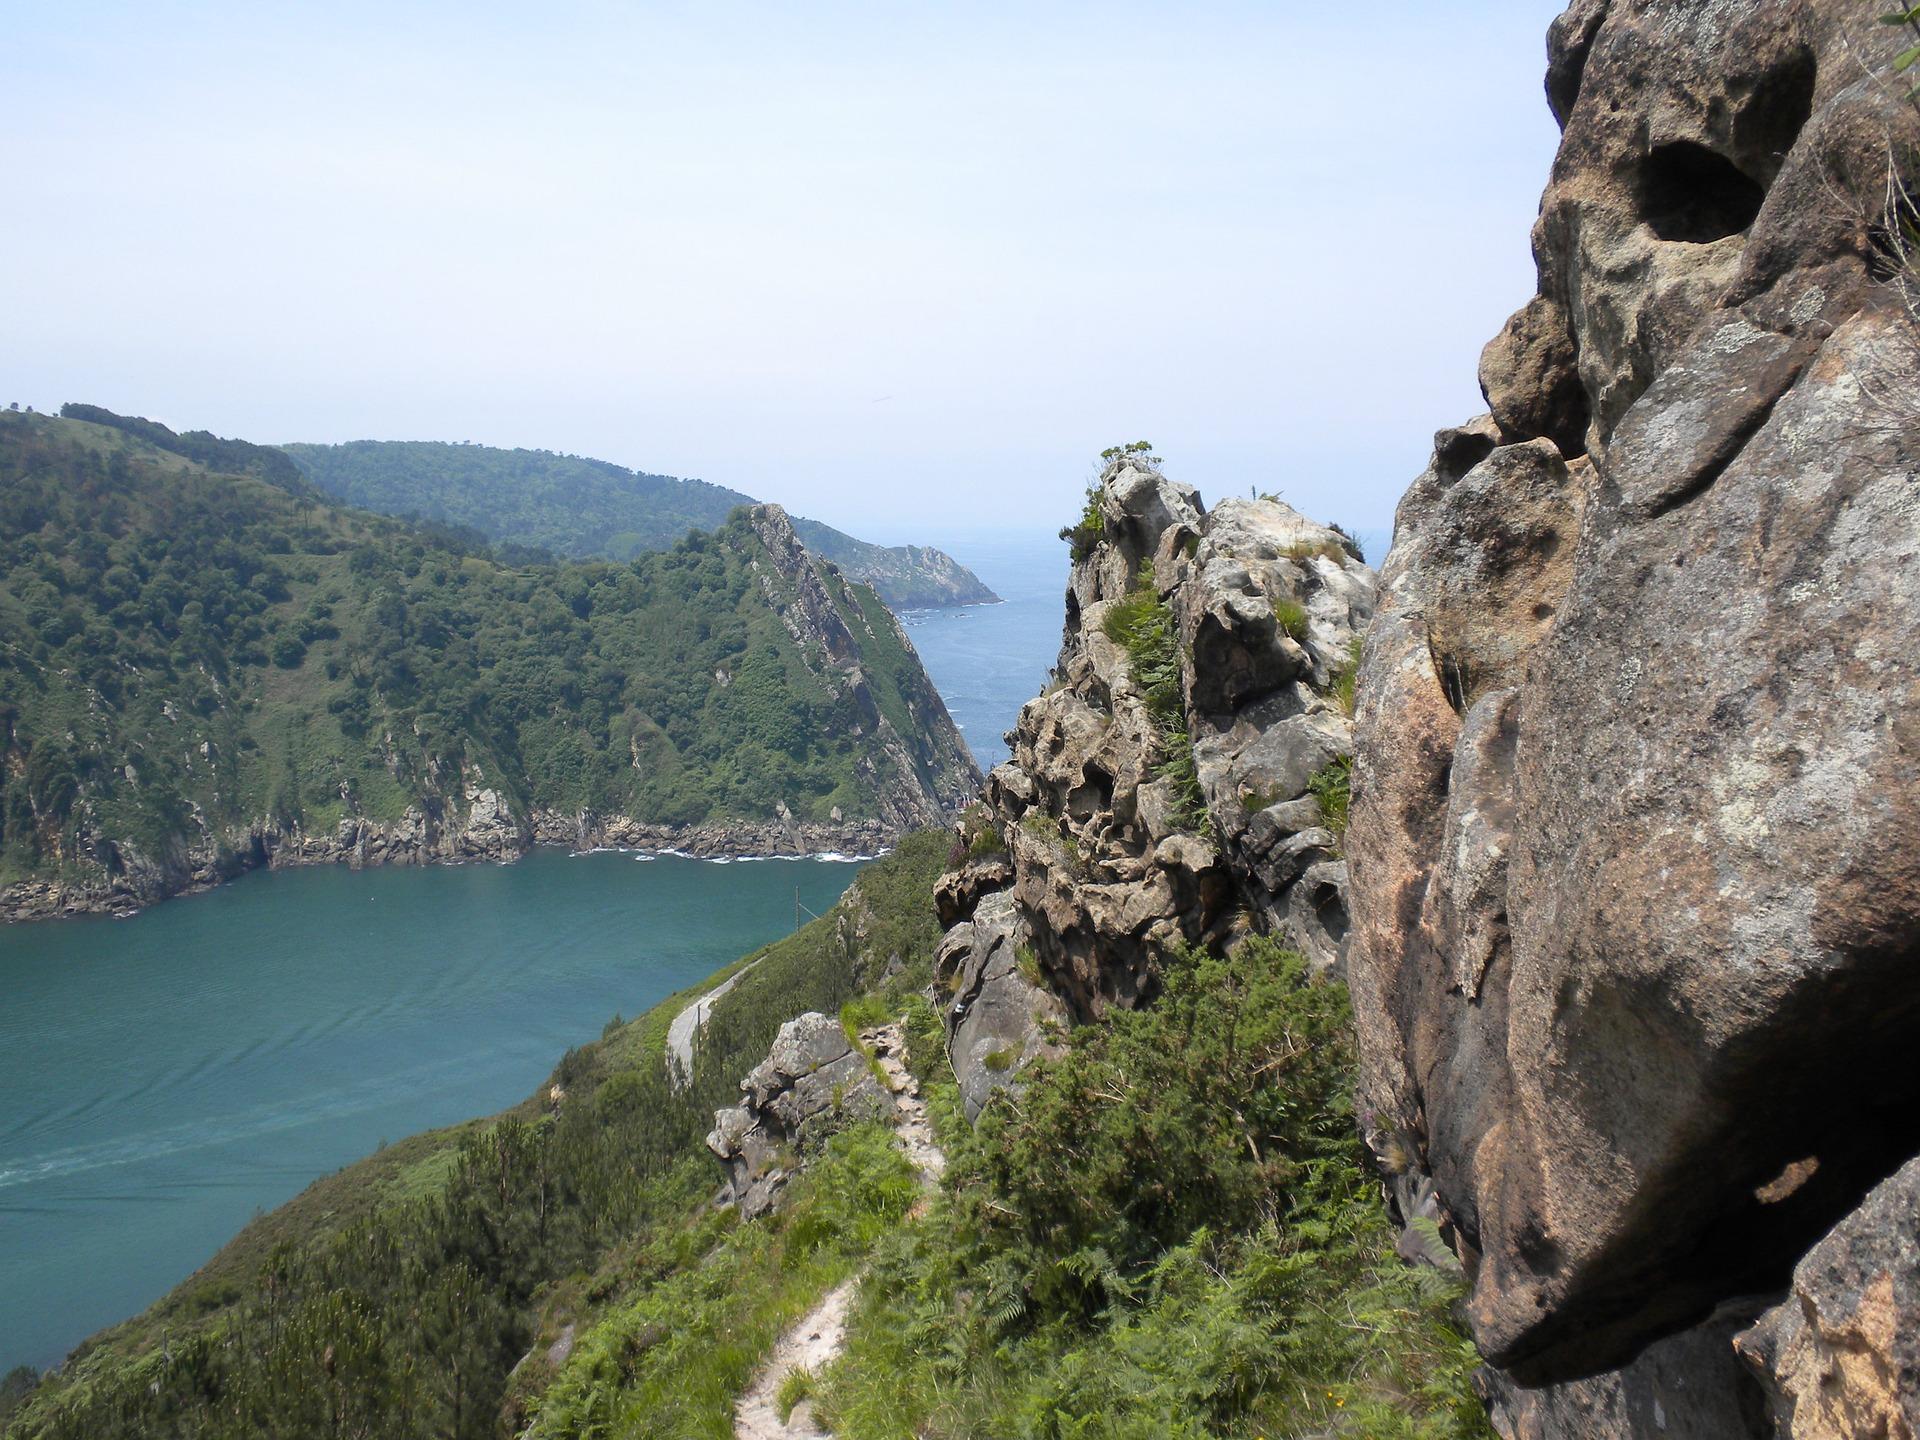 Andorre_nature_2_CC0.jpg?1545814378